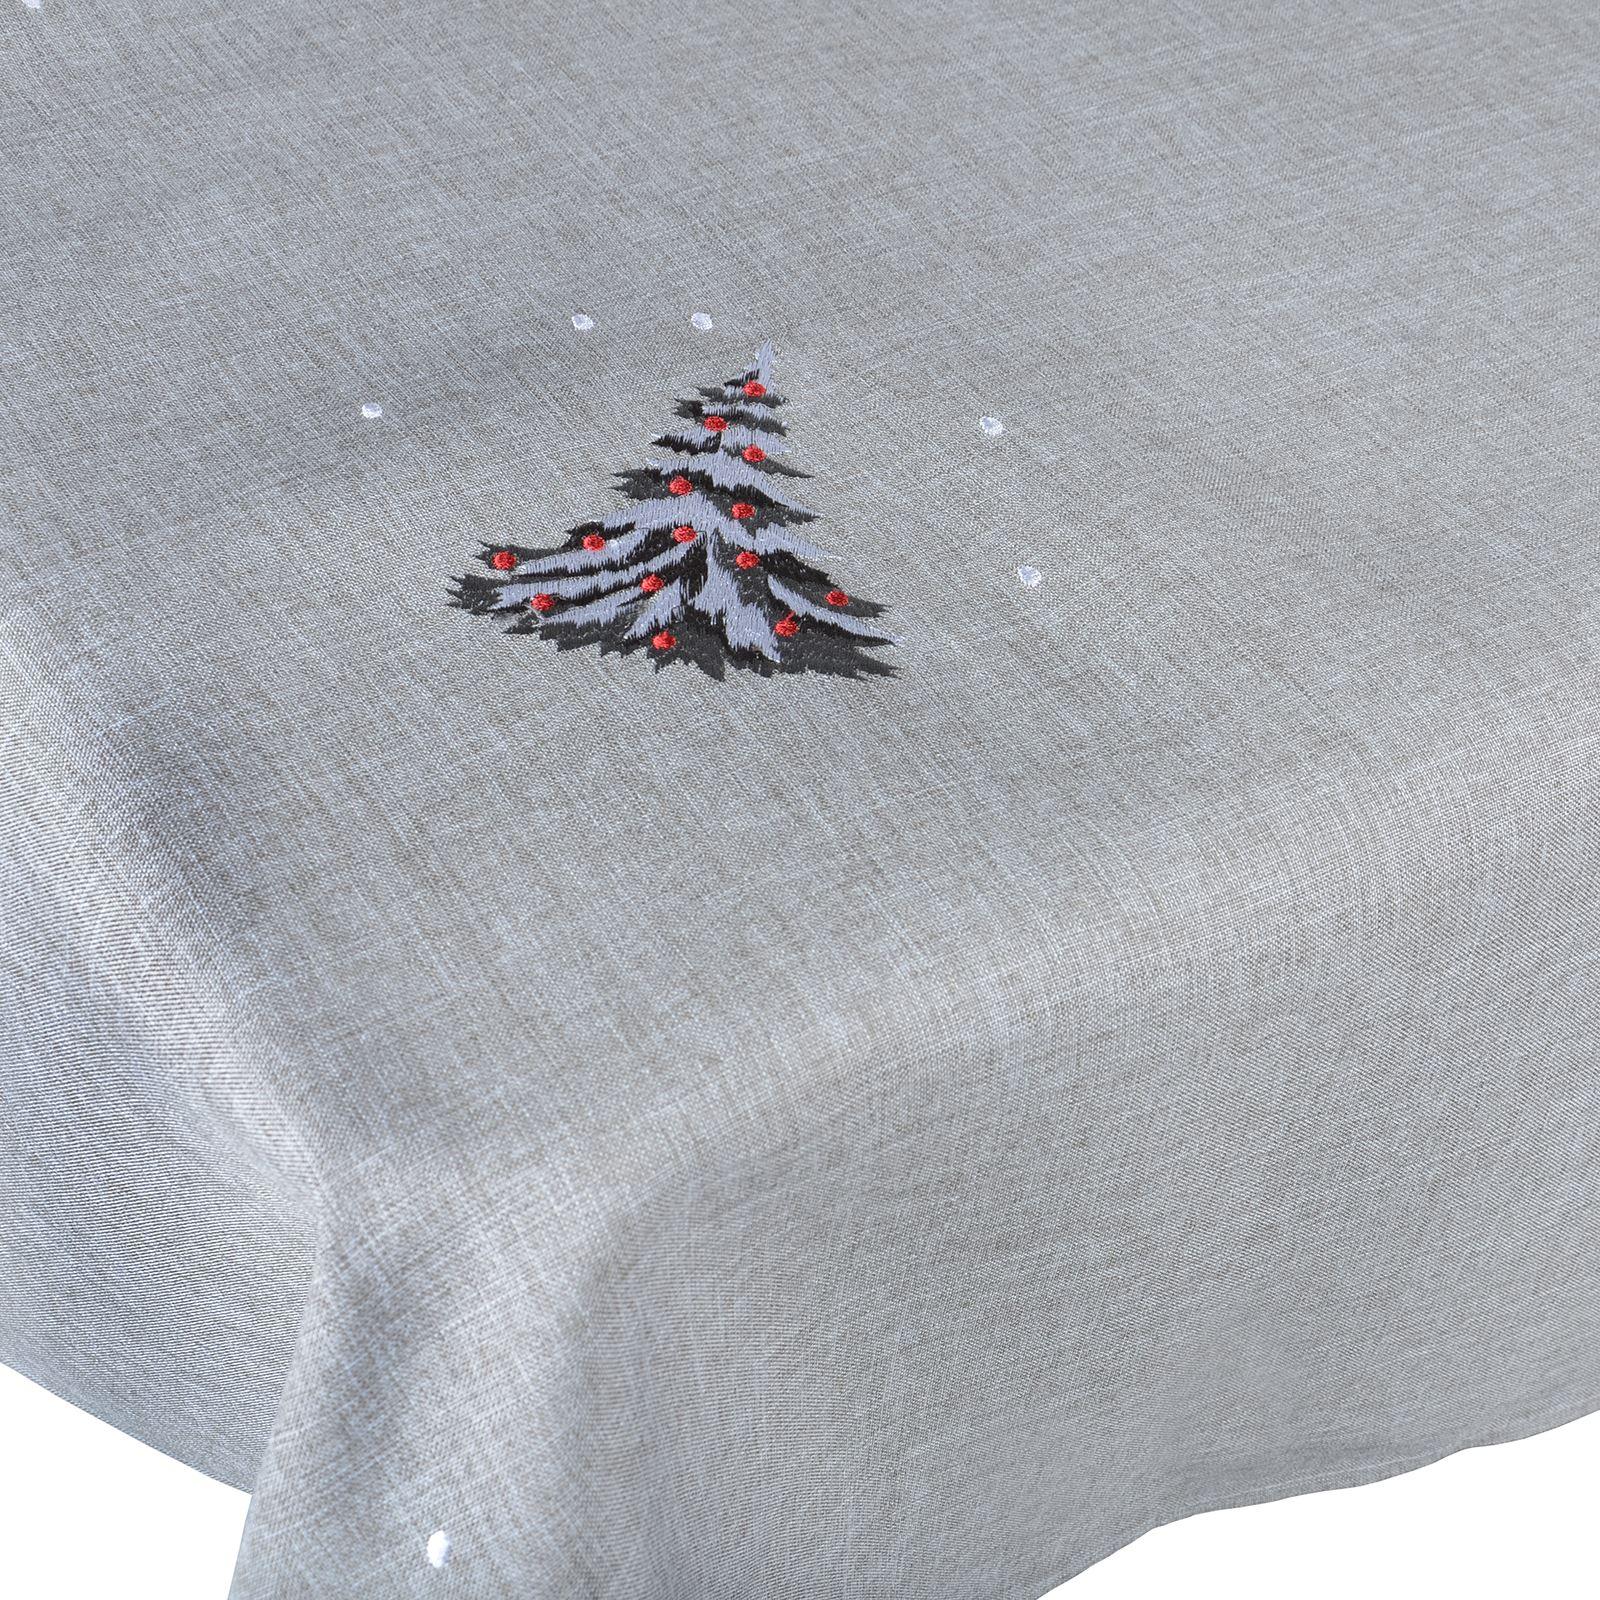 Christmas-Tablecloth-Festive-Pattern-Rectangle-Round-Fabric-Xmas-Room-Decoration Indexbild 52